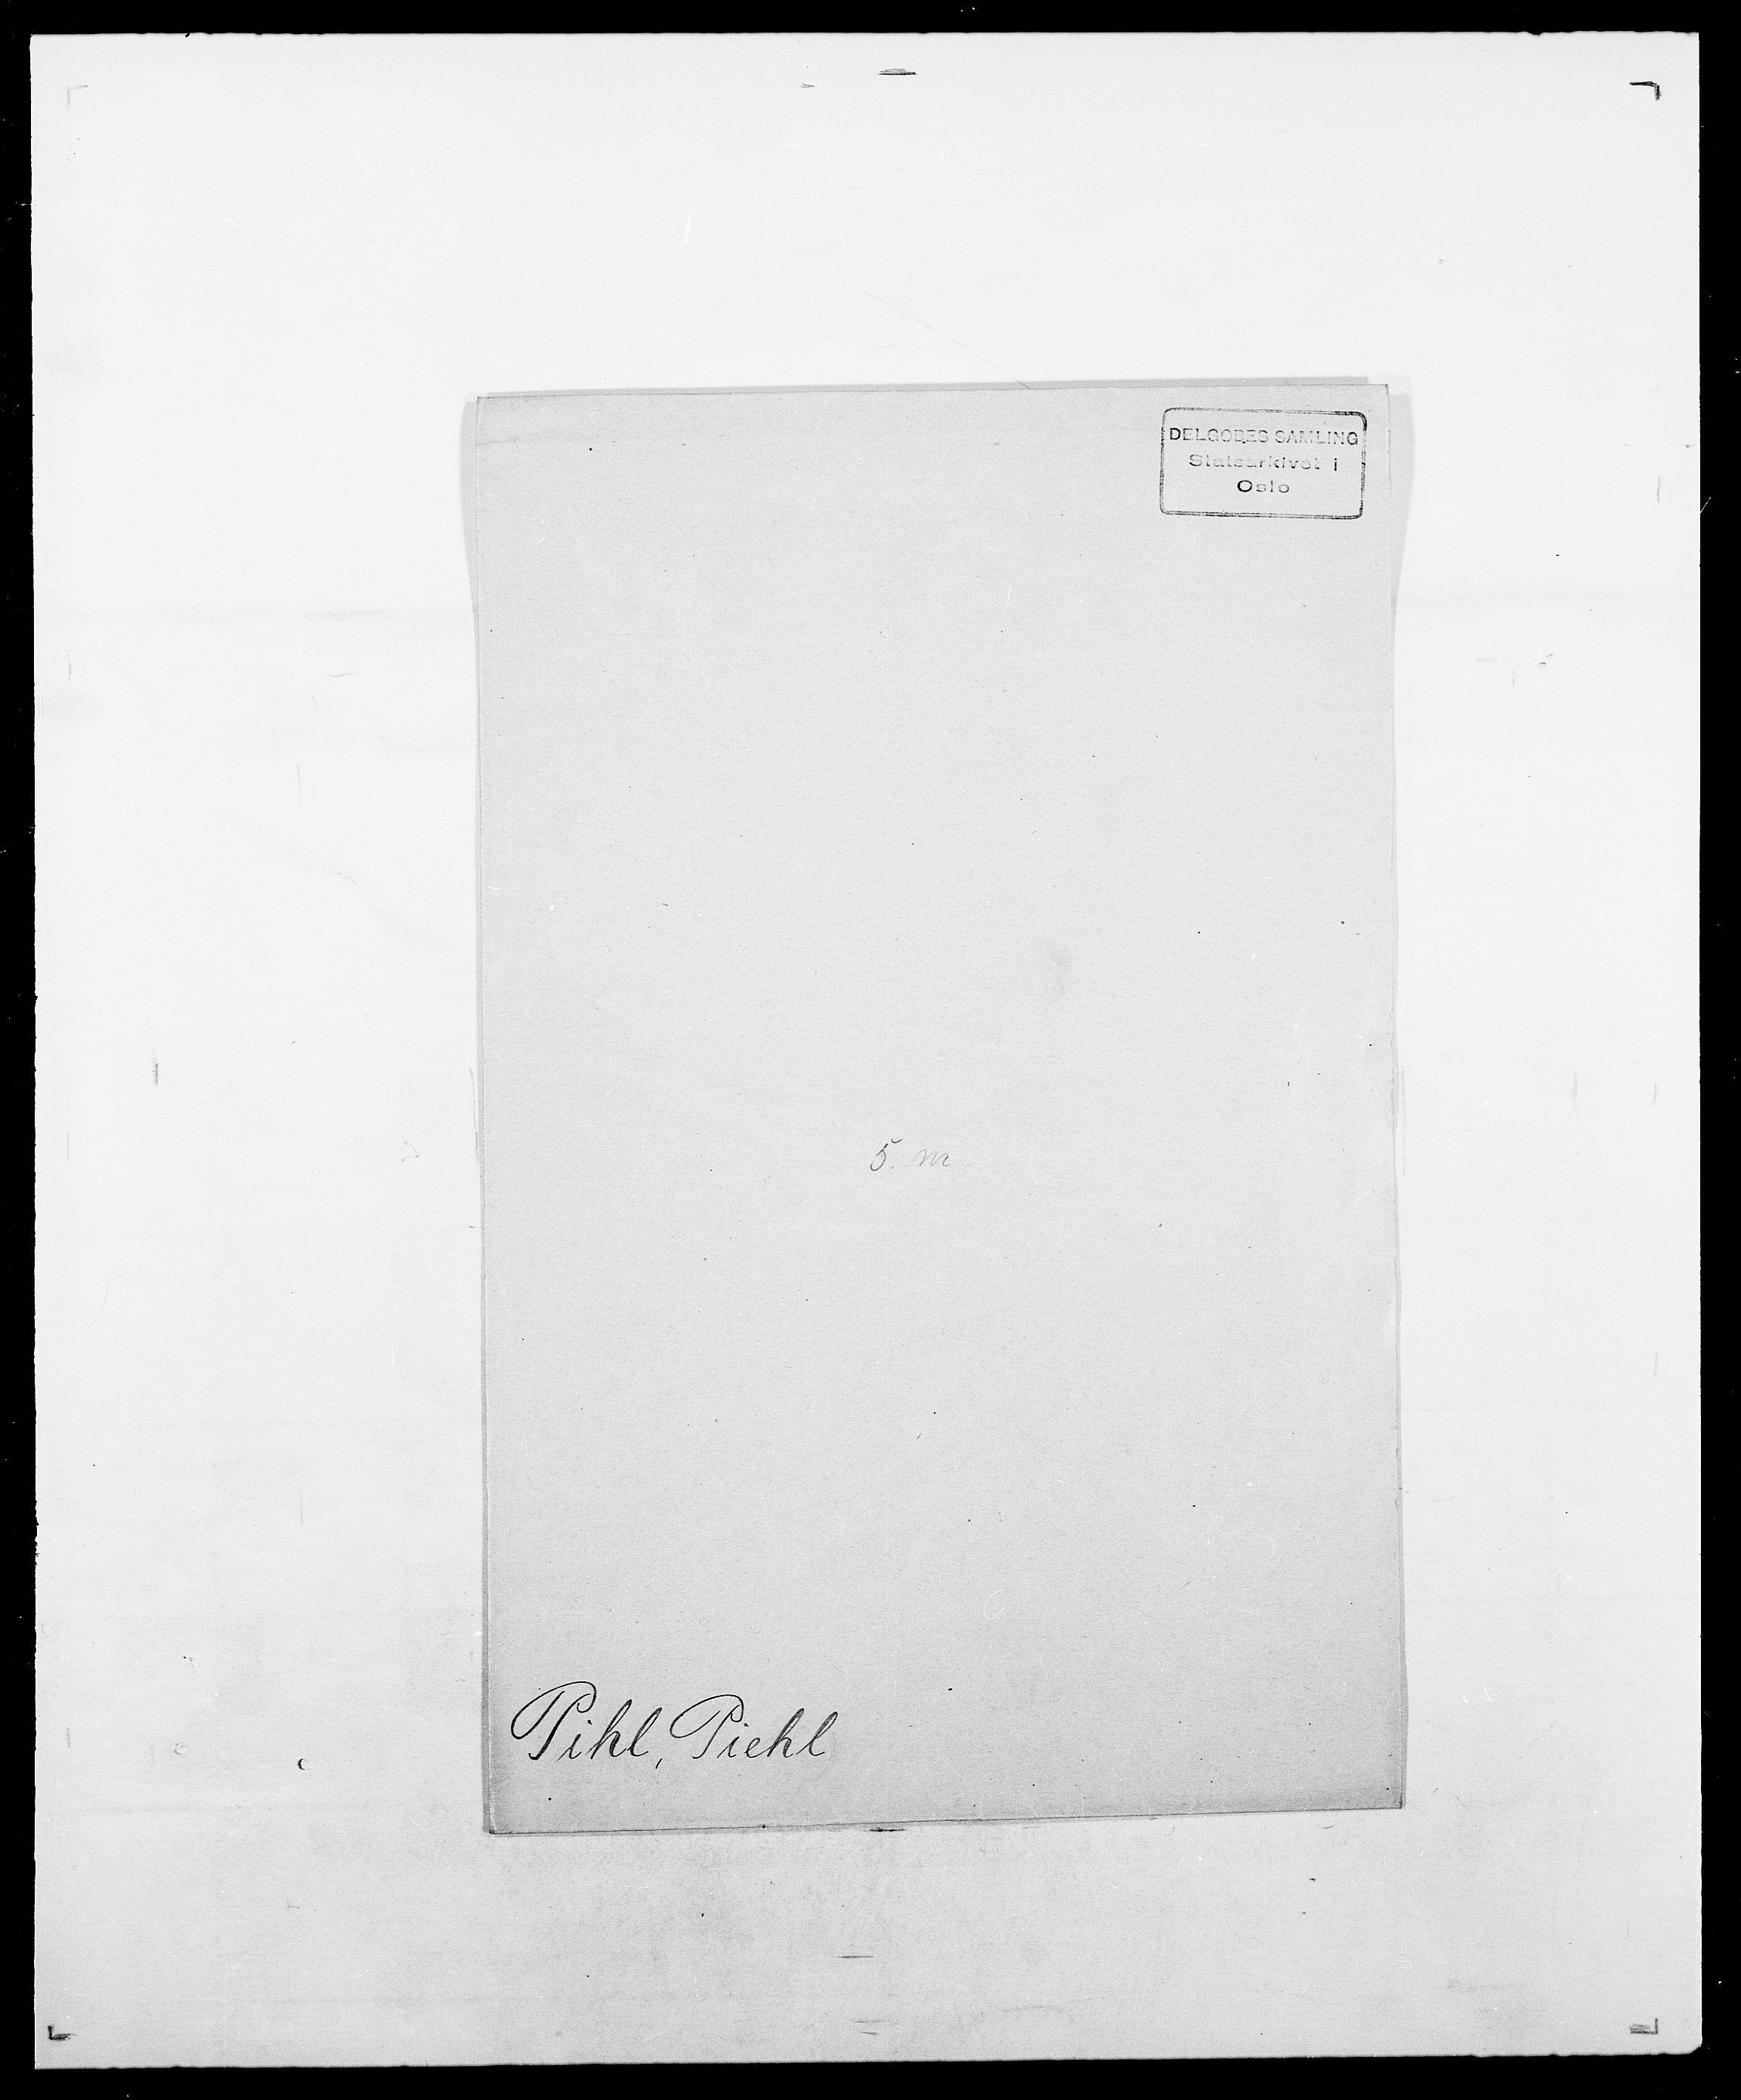 SAO, Delgobe, Charles Antoine - samling, D/Da/L0030: Paars - Pittelkov, s. 533